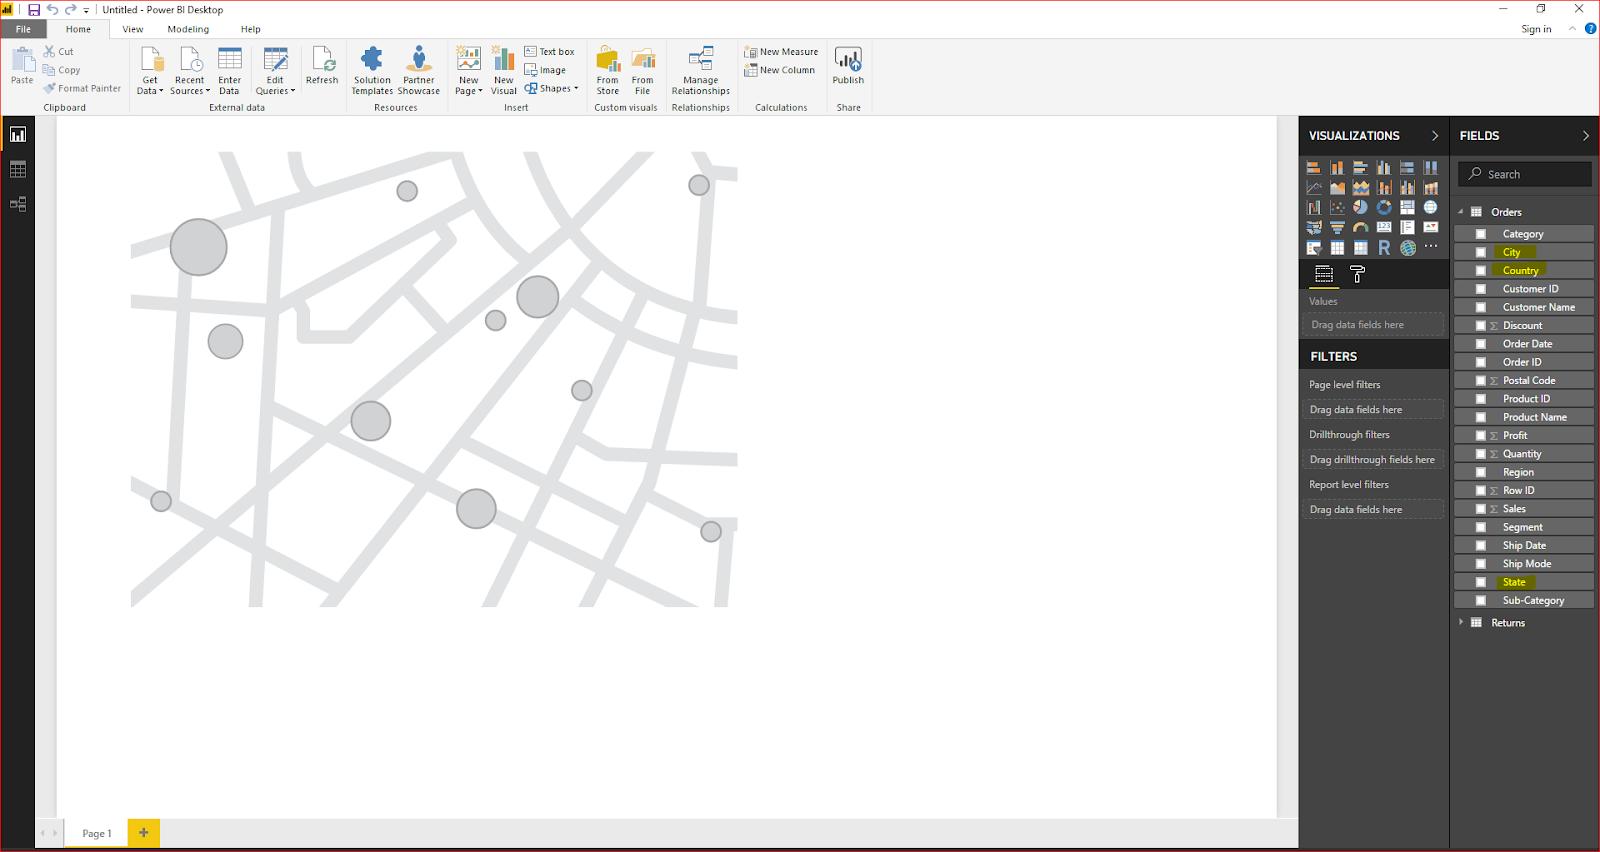 Maps & Hierarchy in Microsoft Power BI 30